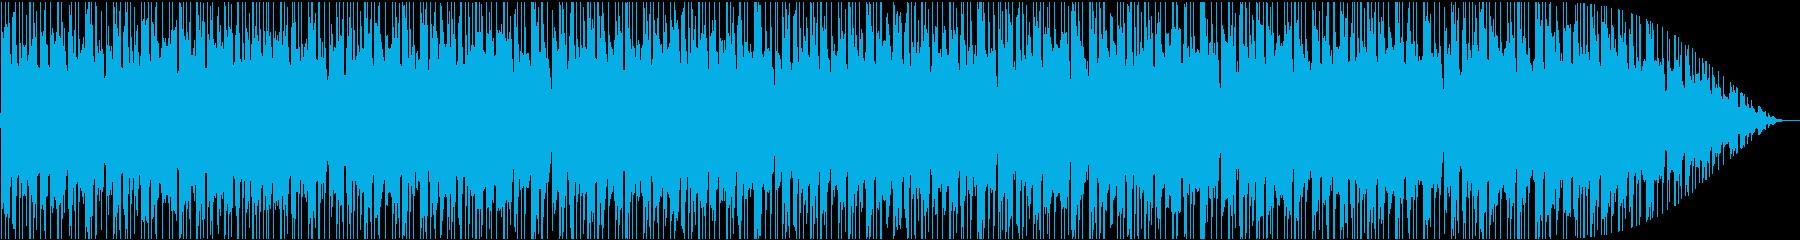 lofi・チル・ヒップホップの再生済みの波形